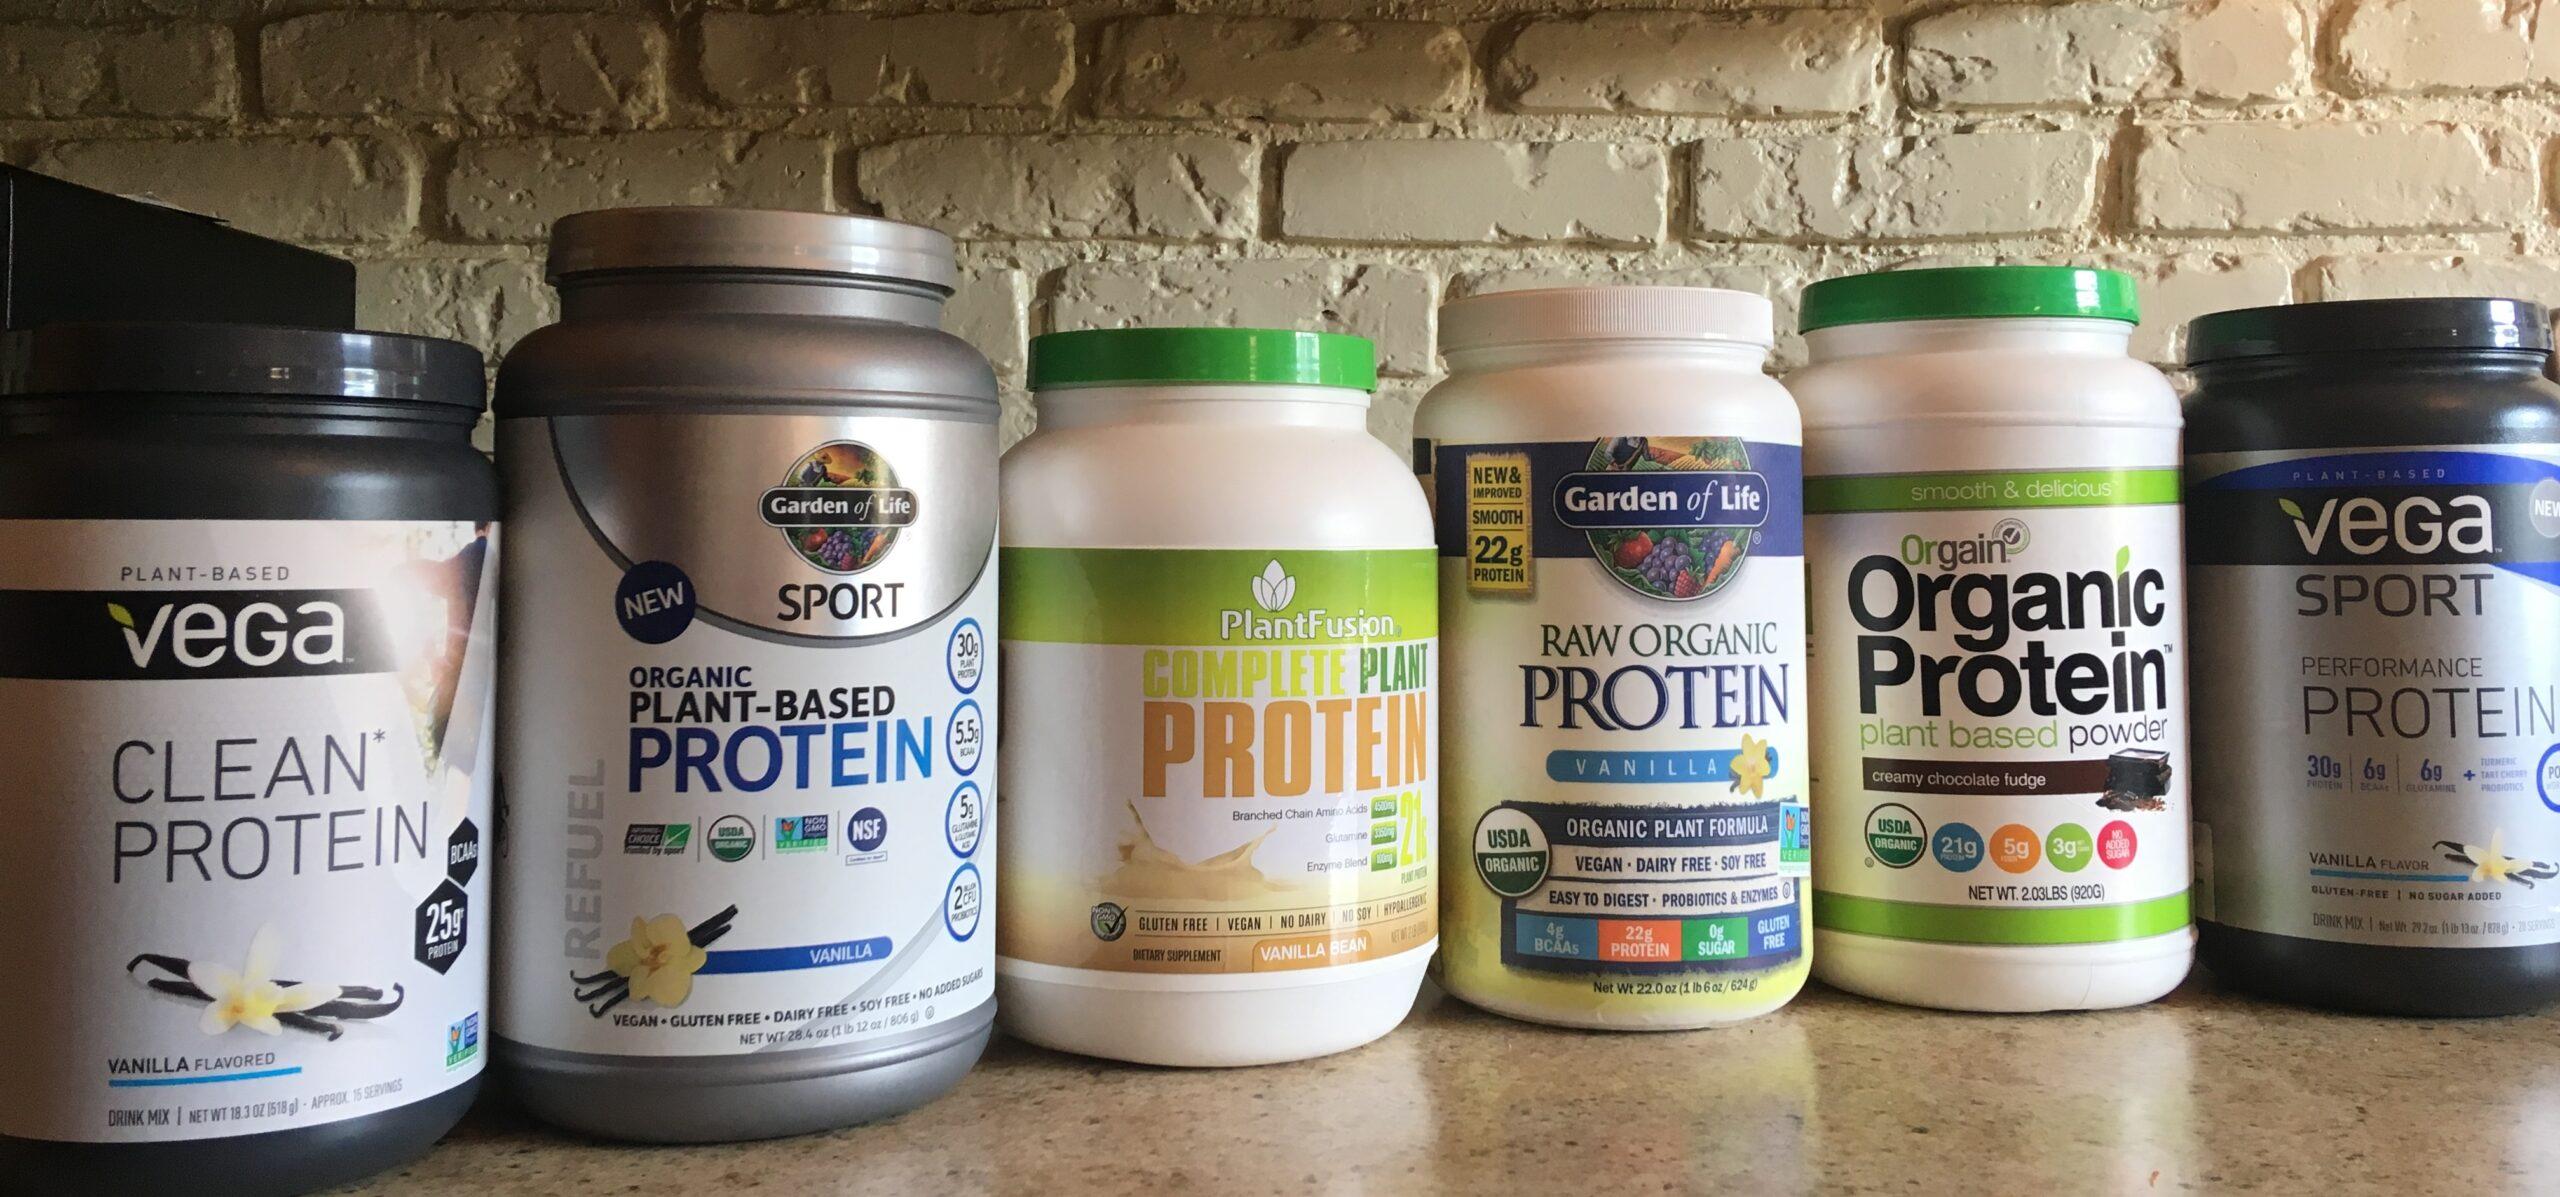 plant based vegan protein powders